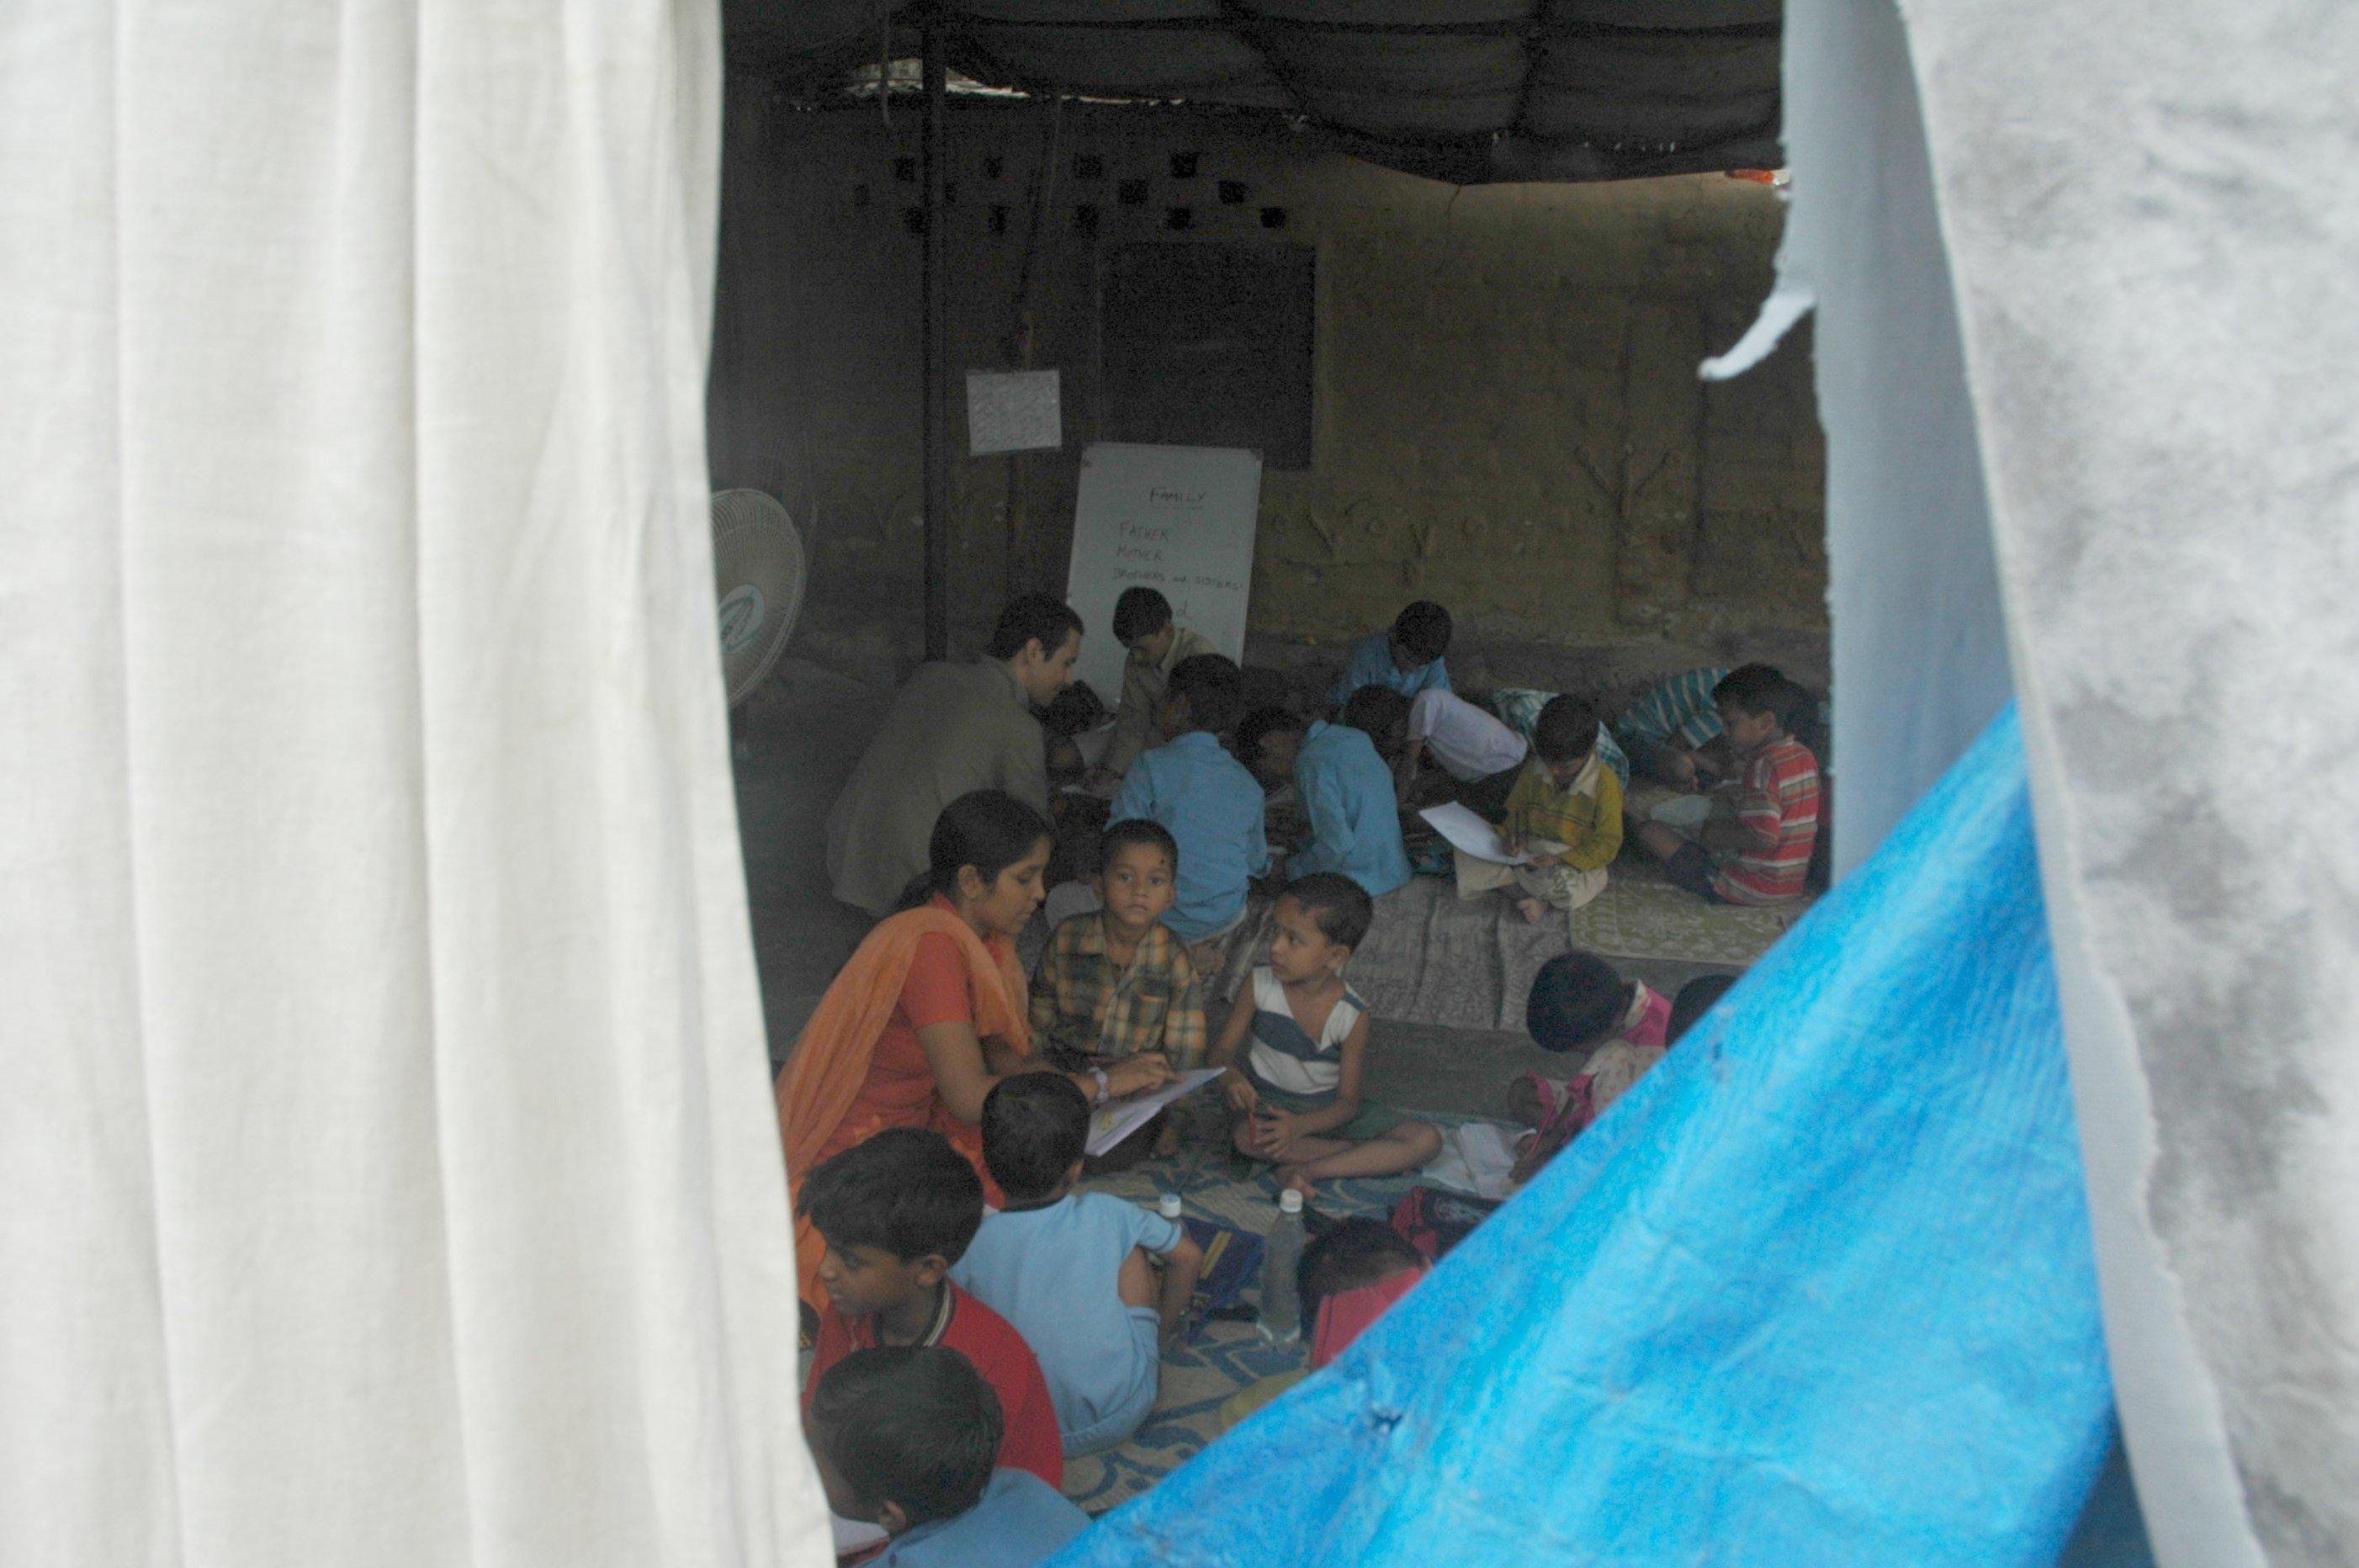 World through the hole, slum school, New Delhi, India